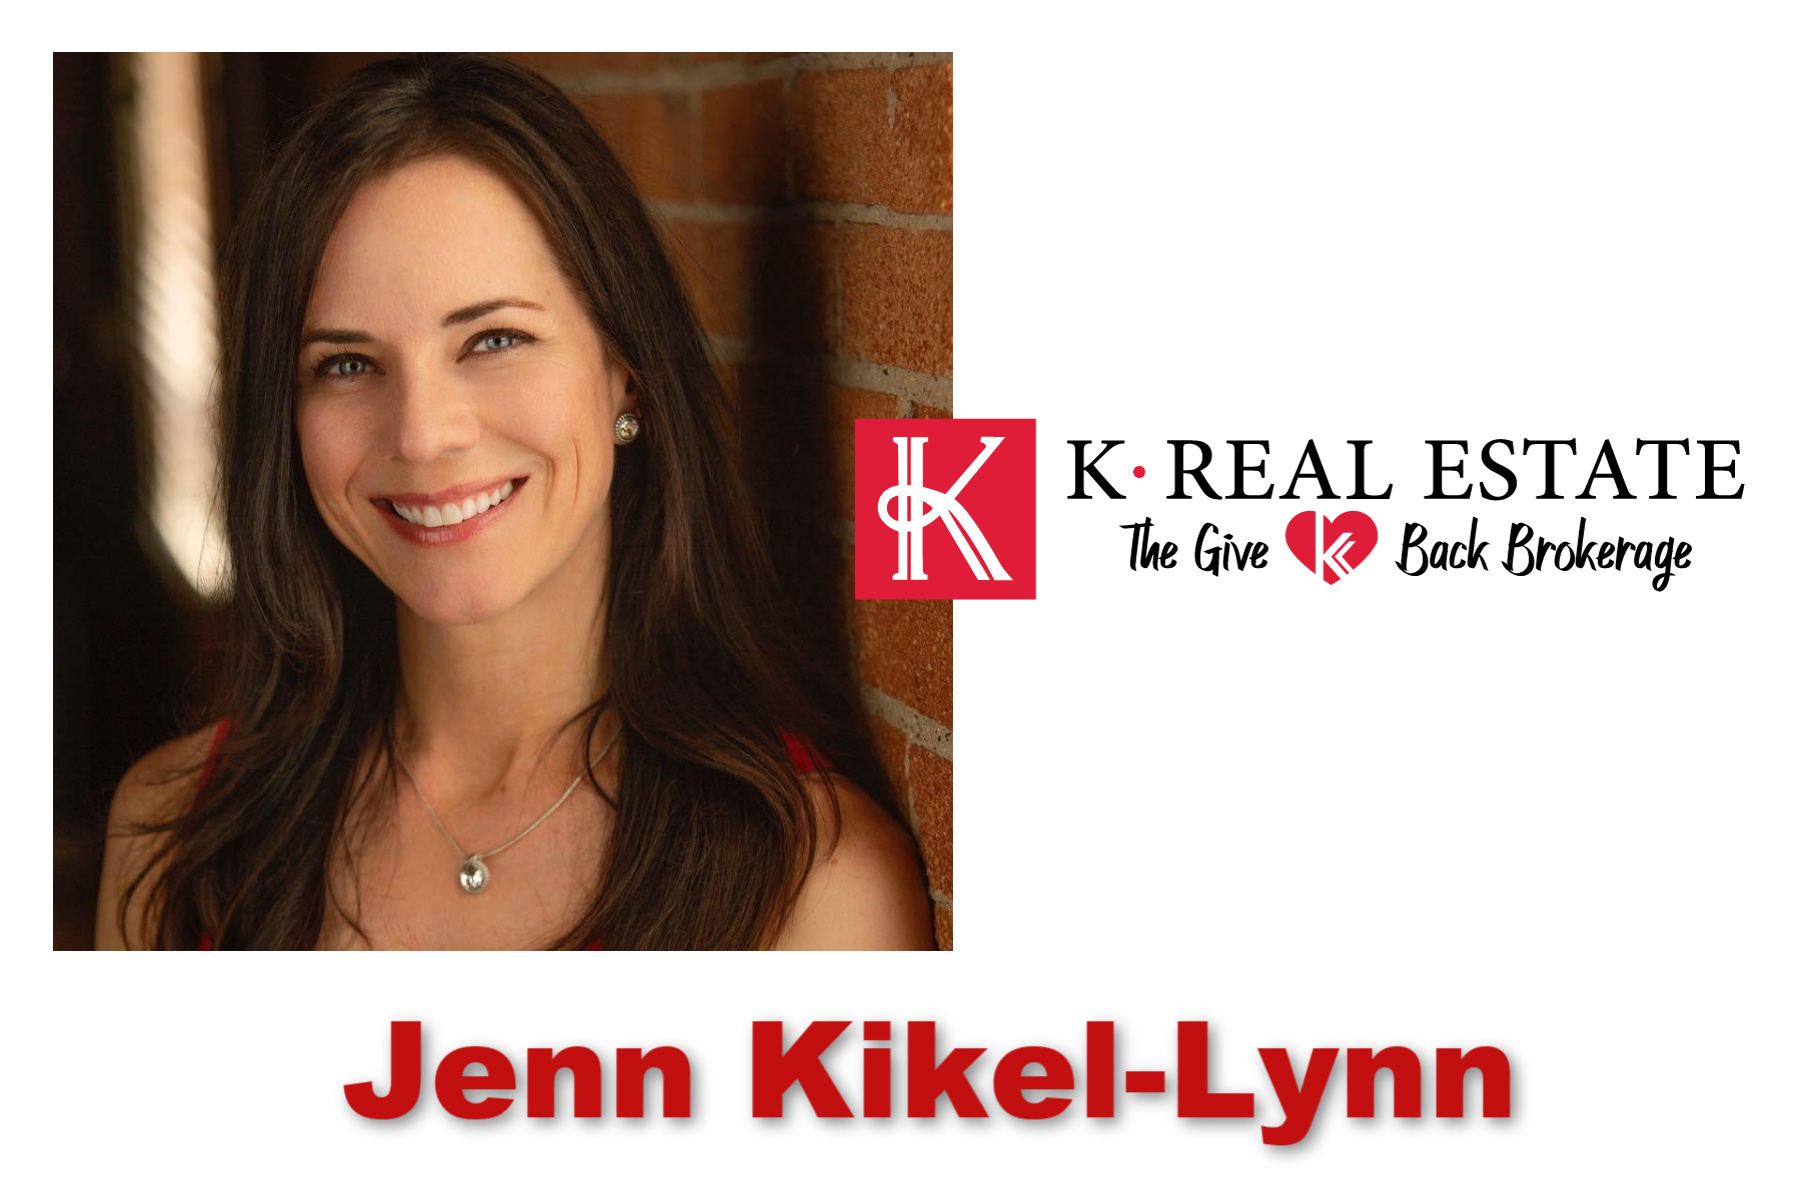 Jenn Kikel-Lynn